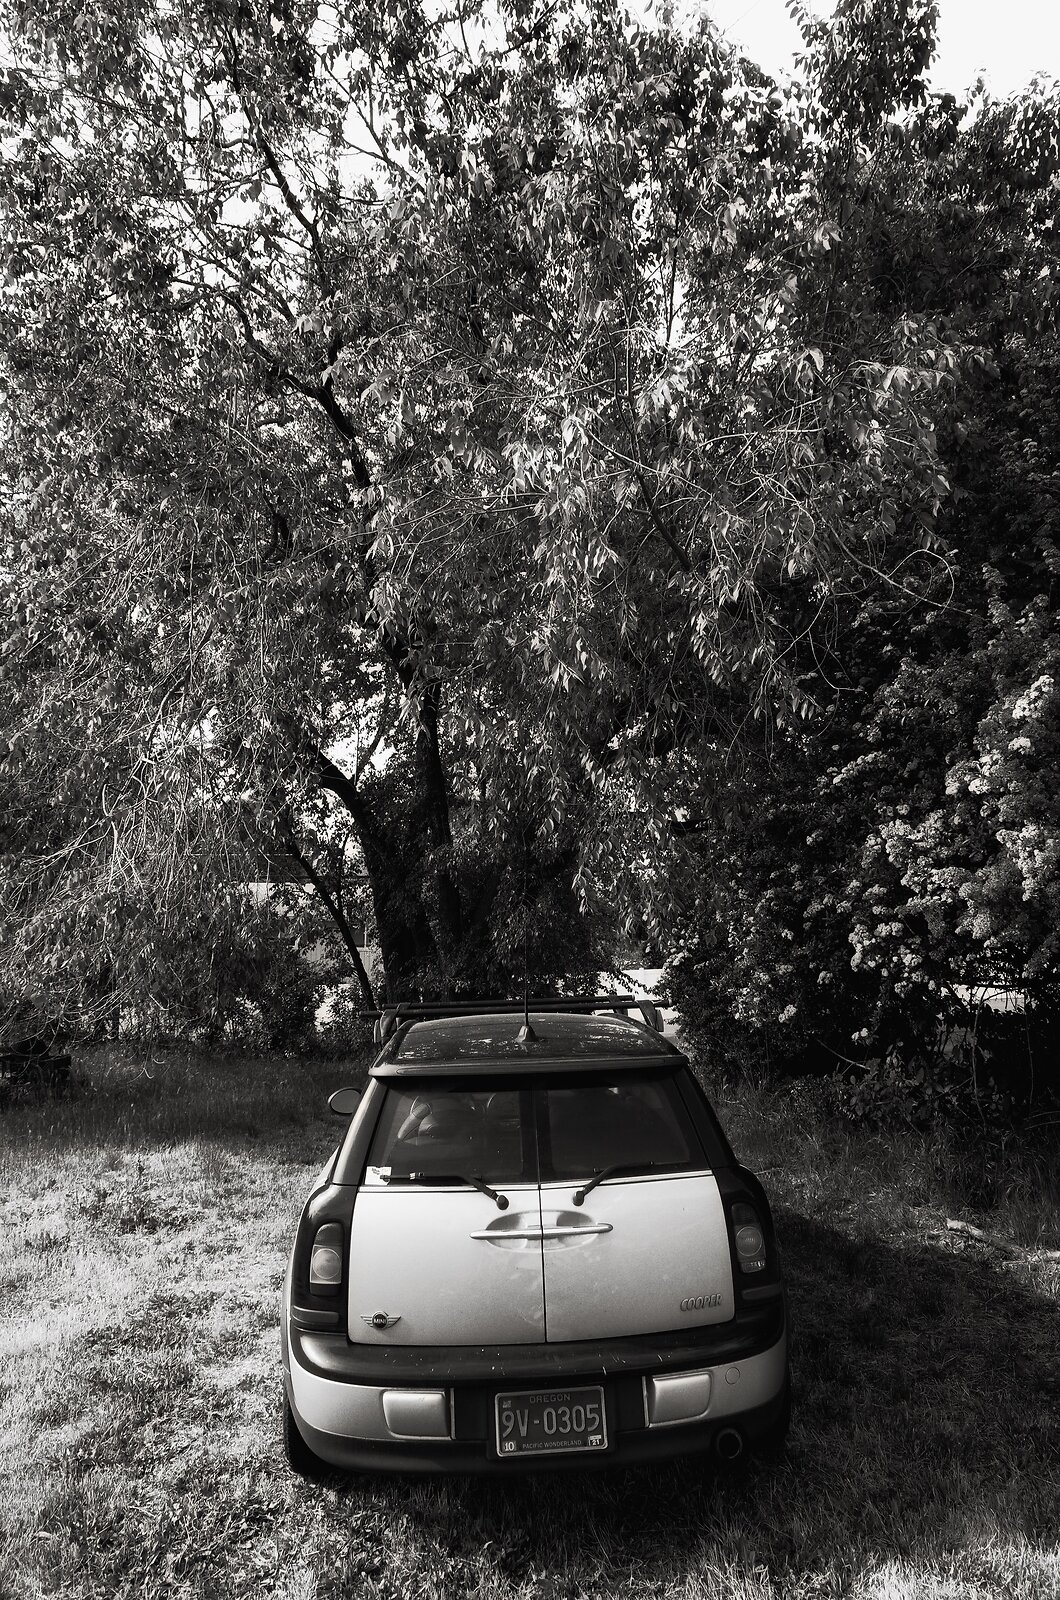 GRII_May25_Mini_under_trees.jpg